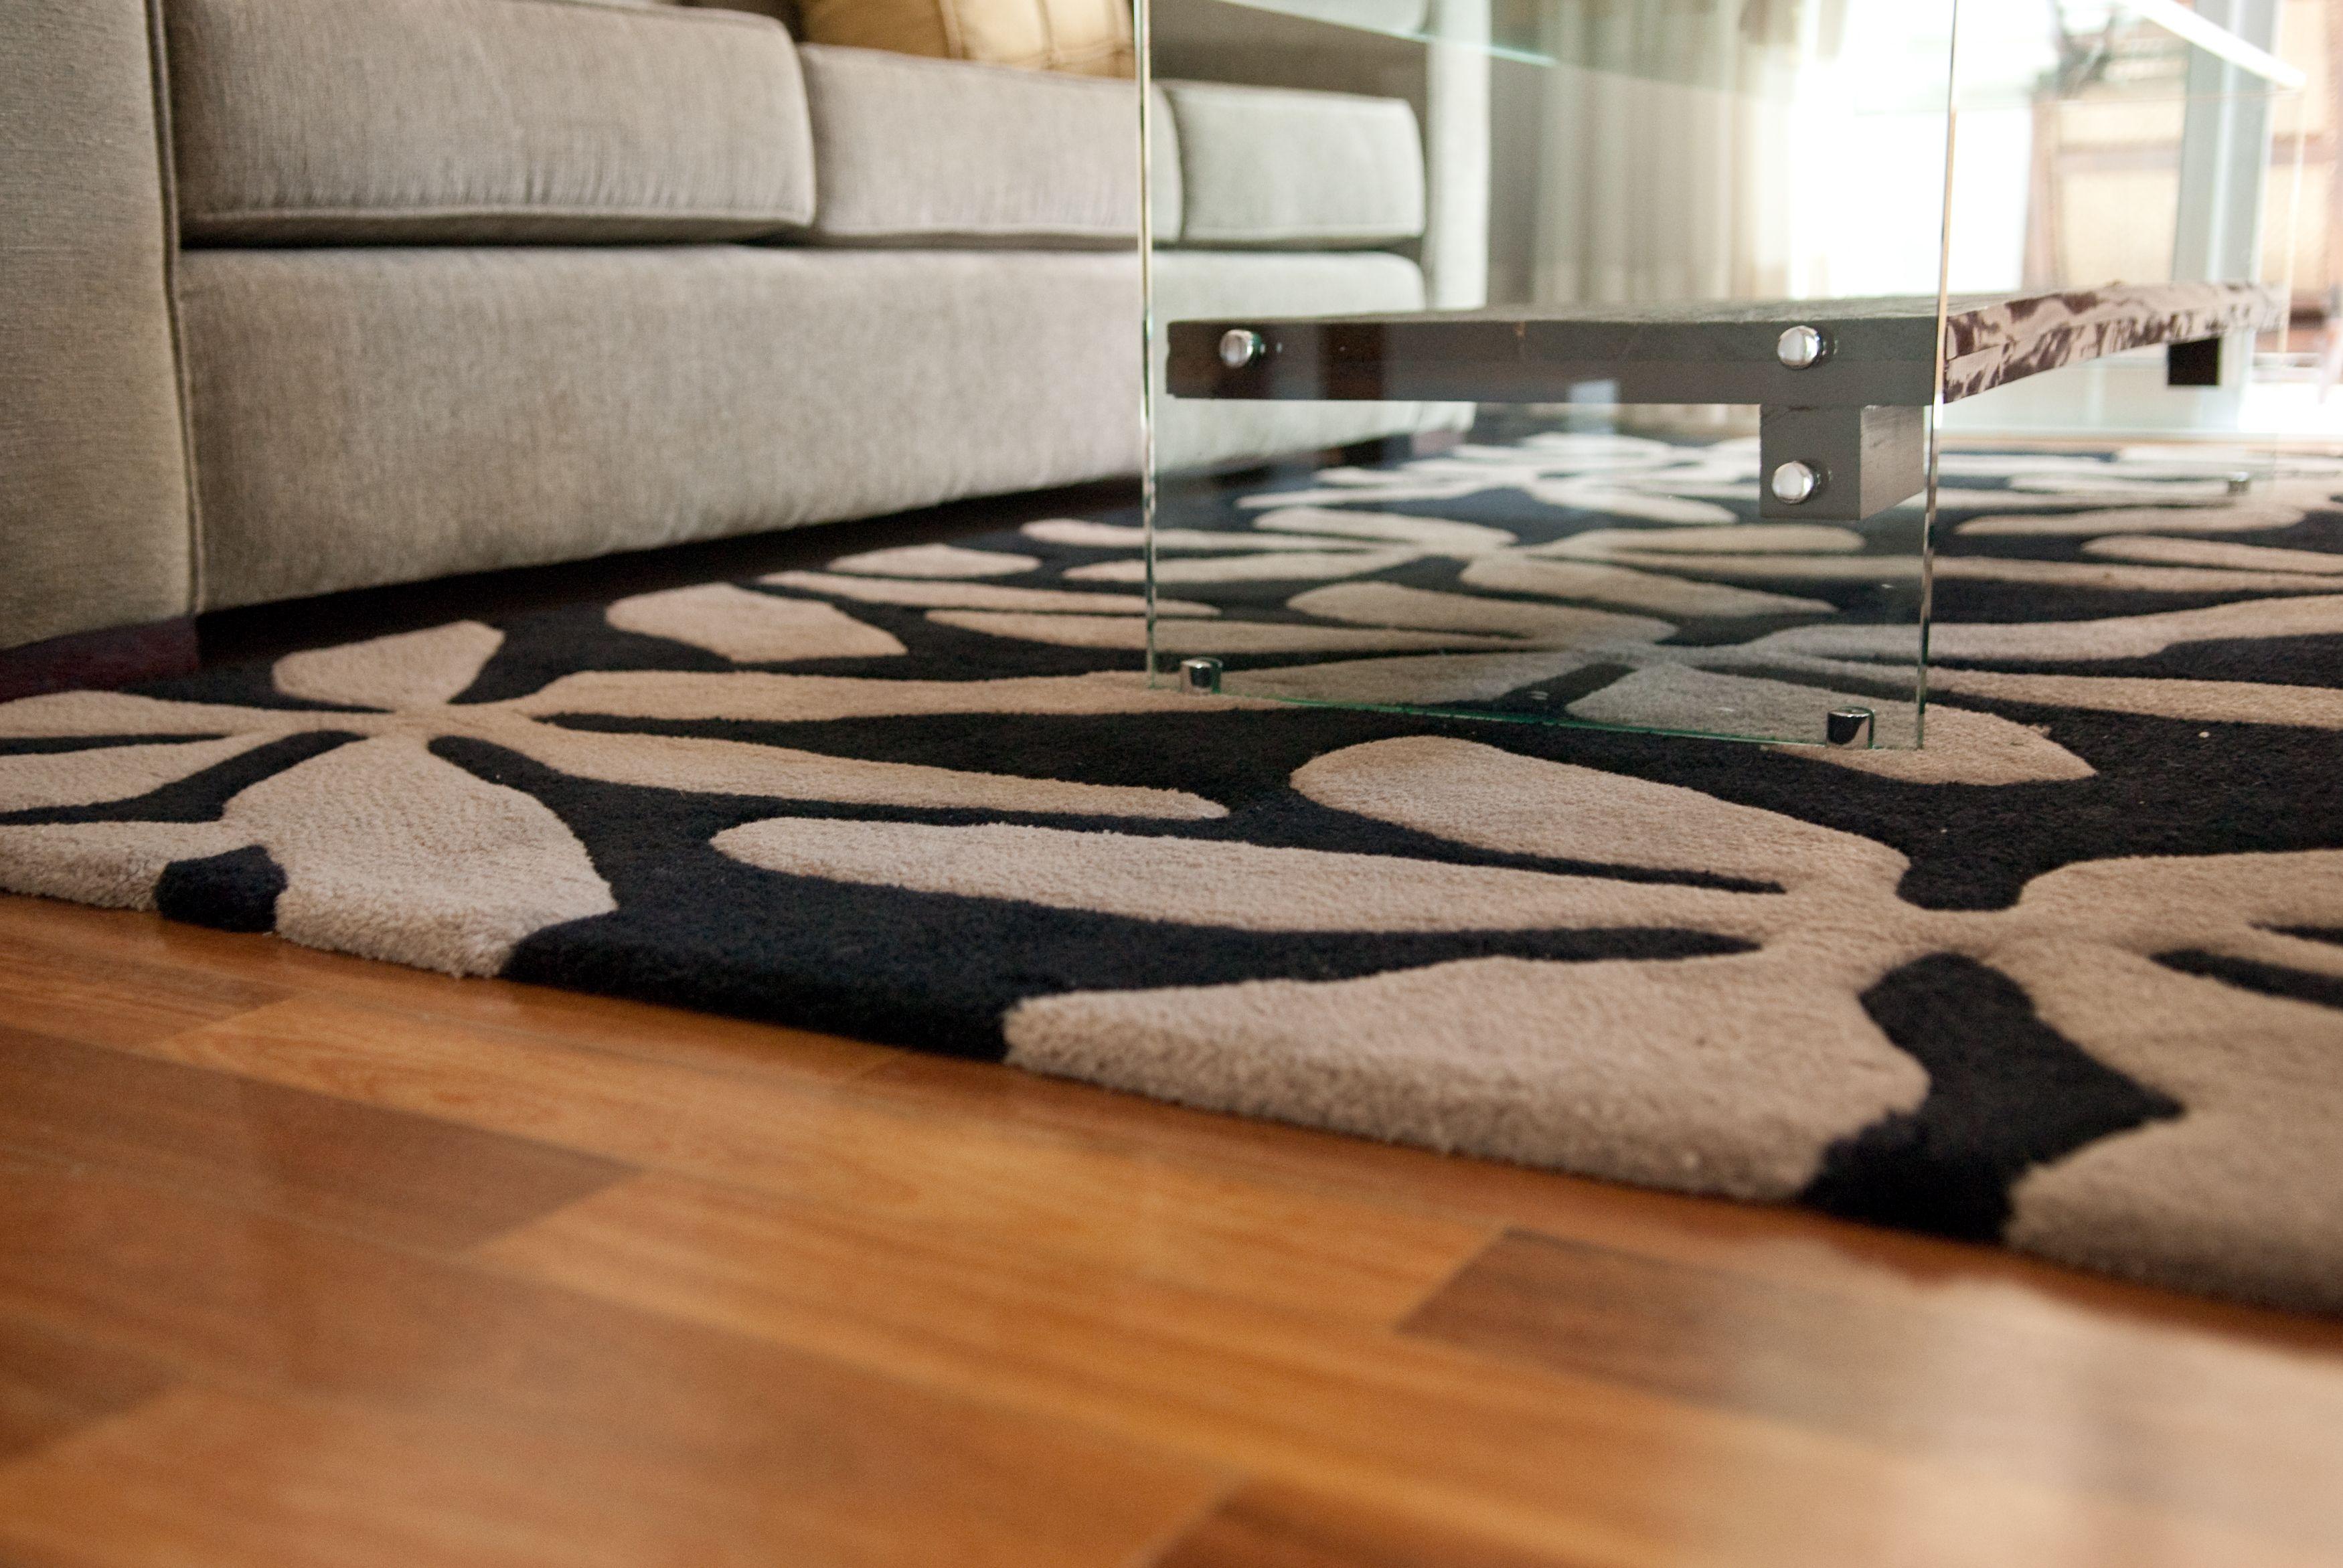 Santa Monica Tapetes E Carpetes Modelo Minueto Ambientado Por Mauricio Groke Preto Pedra Tapete Carpete Santa Monica Deco Tapetes Tapete Tamanho Do Tapete